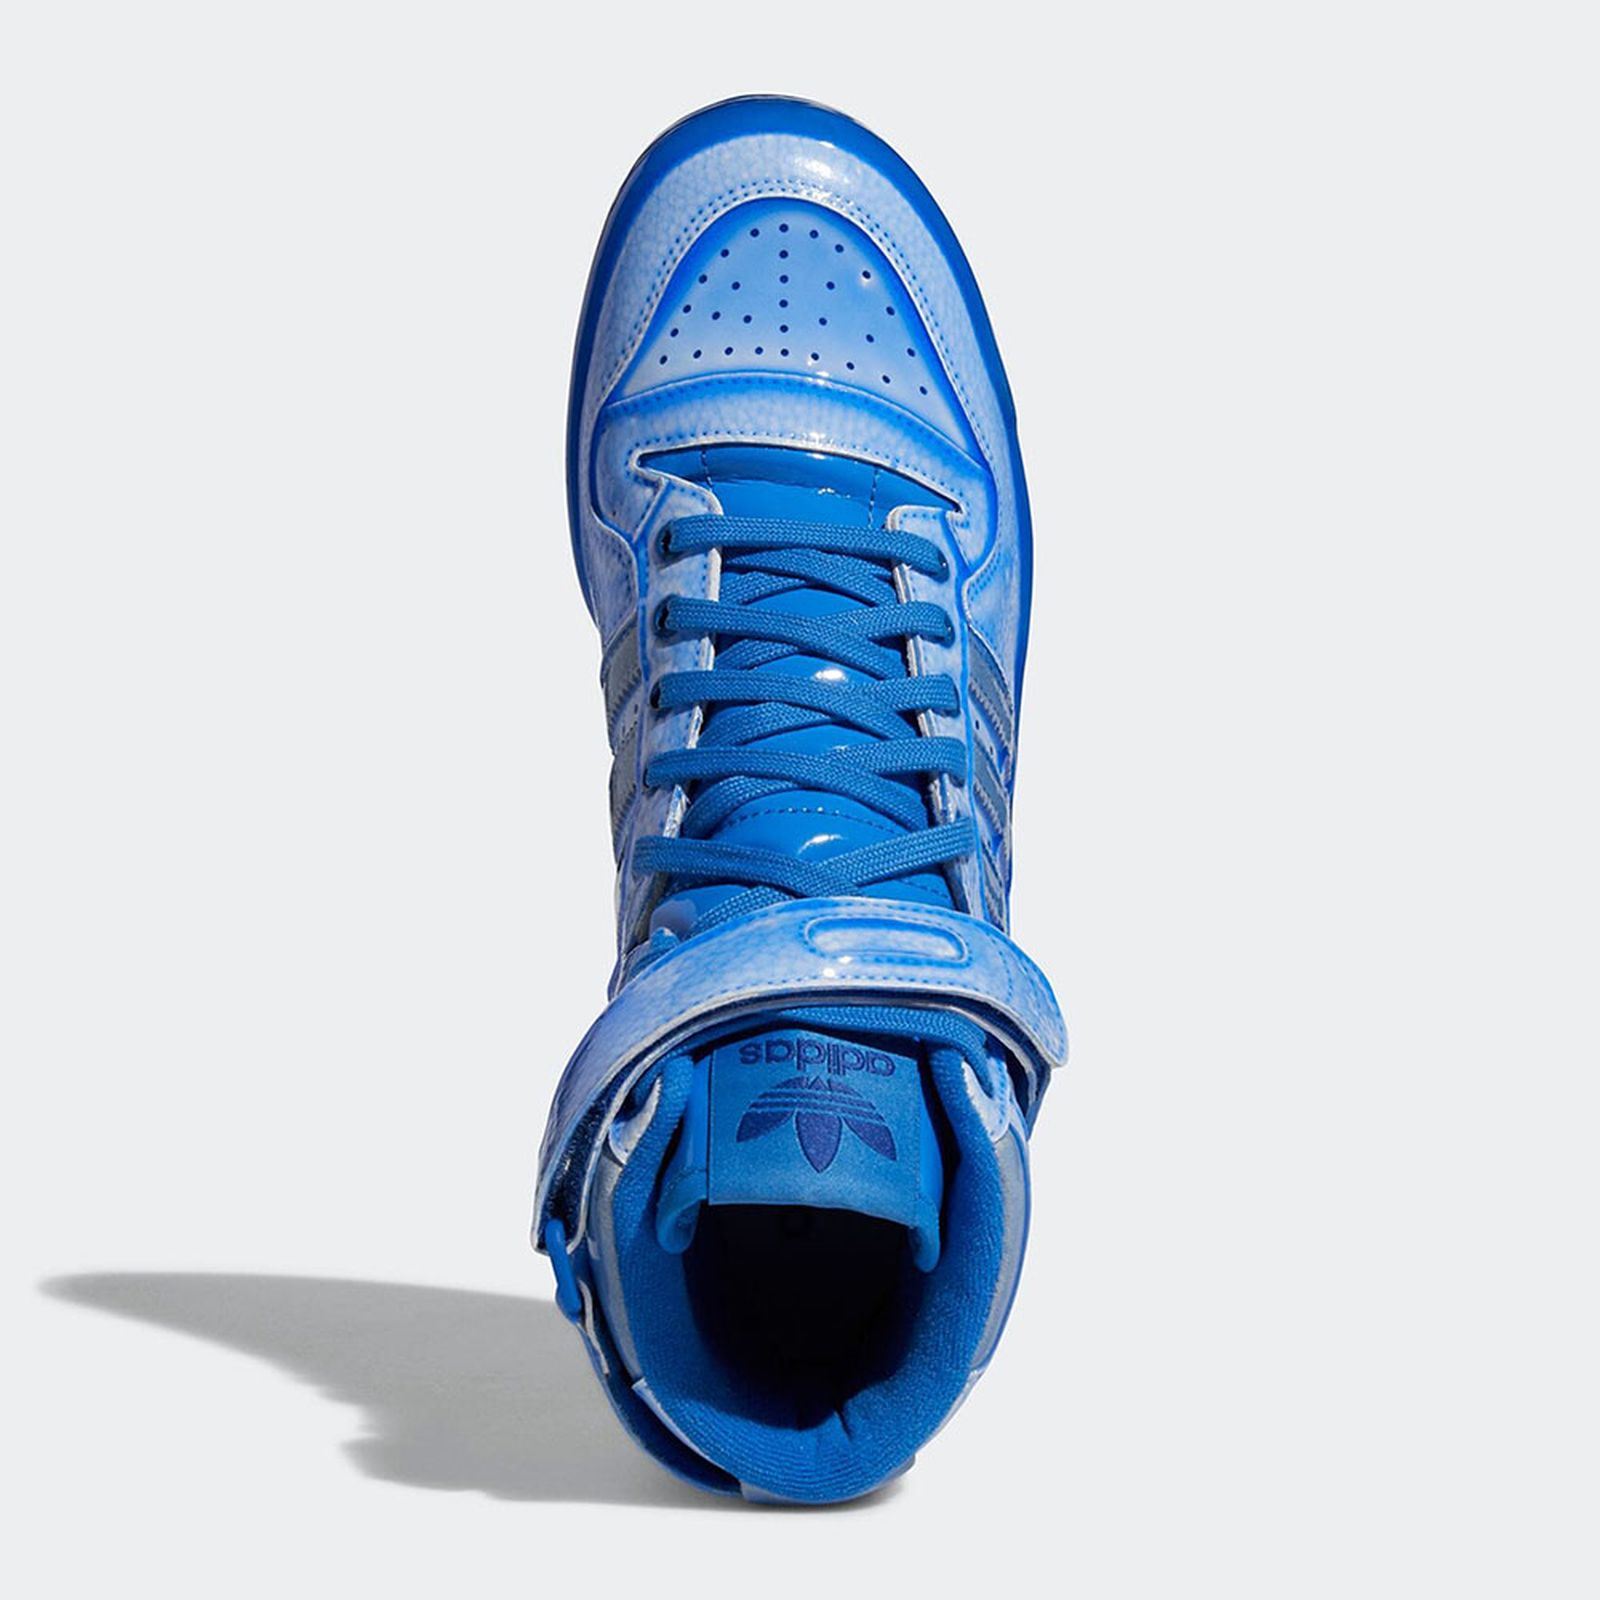 jeremy-scott-adidas-forum-hi-release-date-price-19